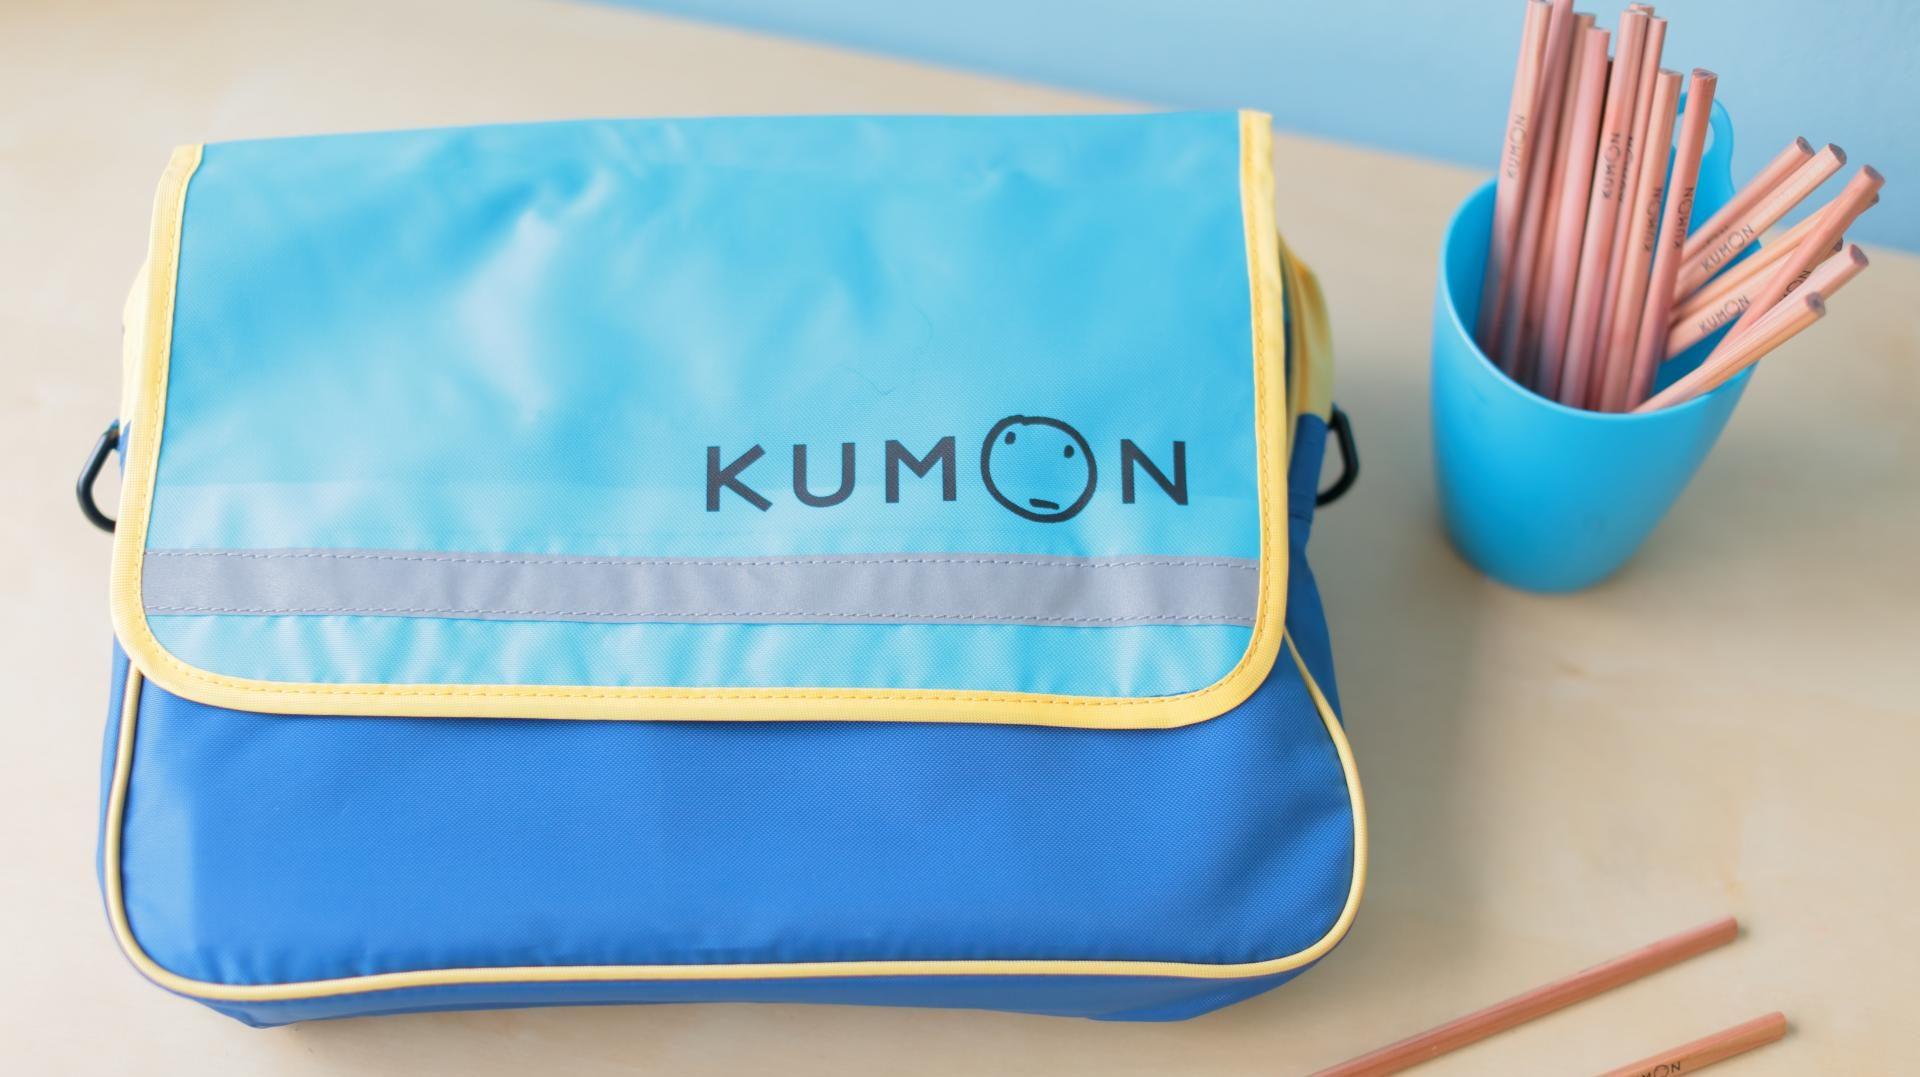 Going through the Kumon Programs